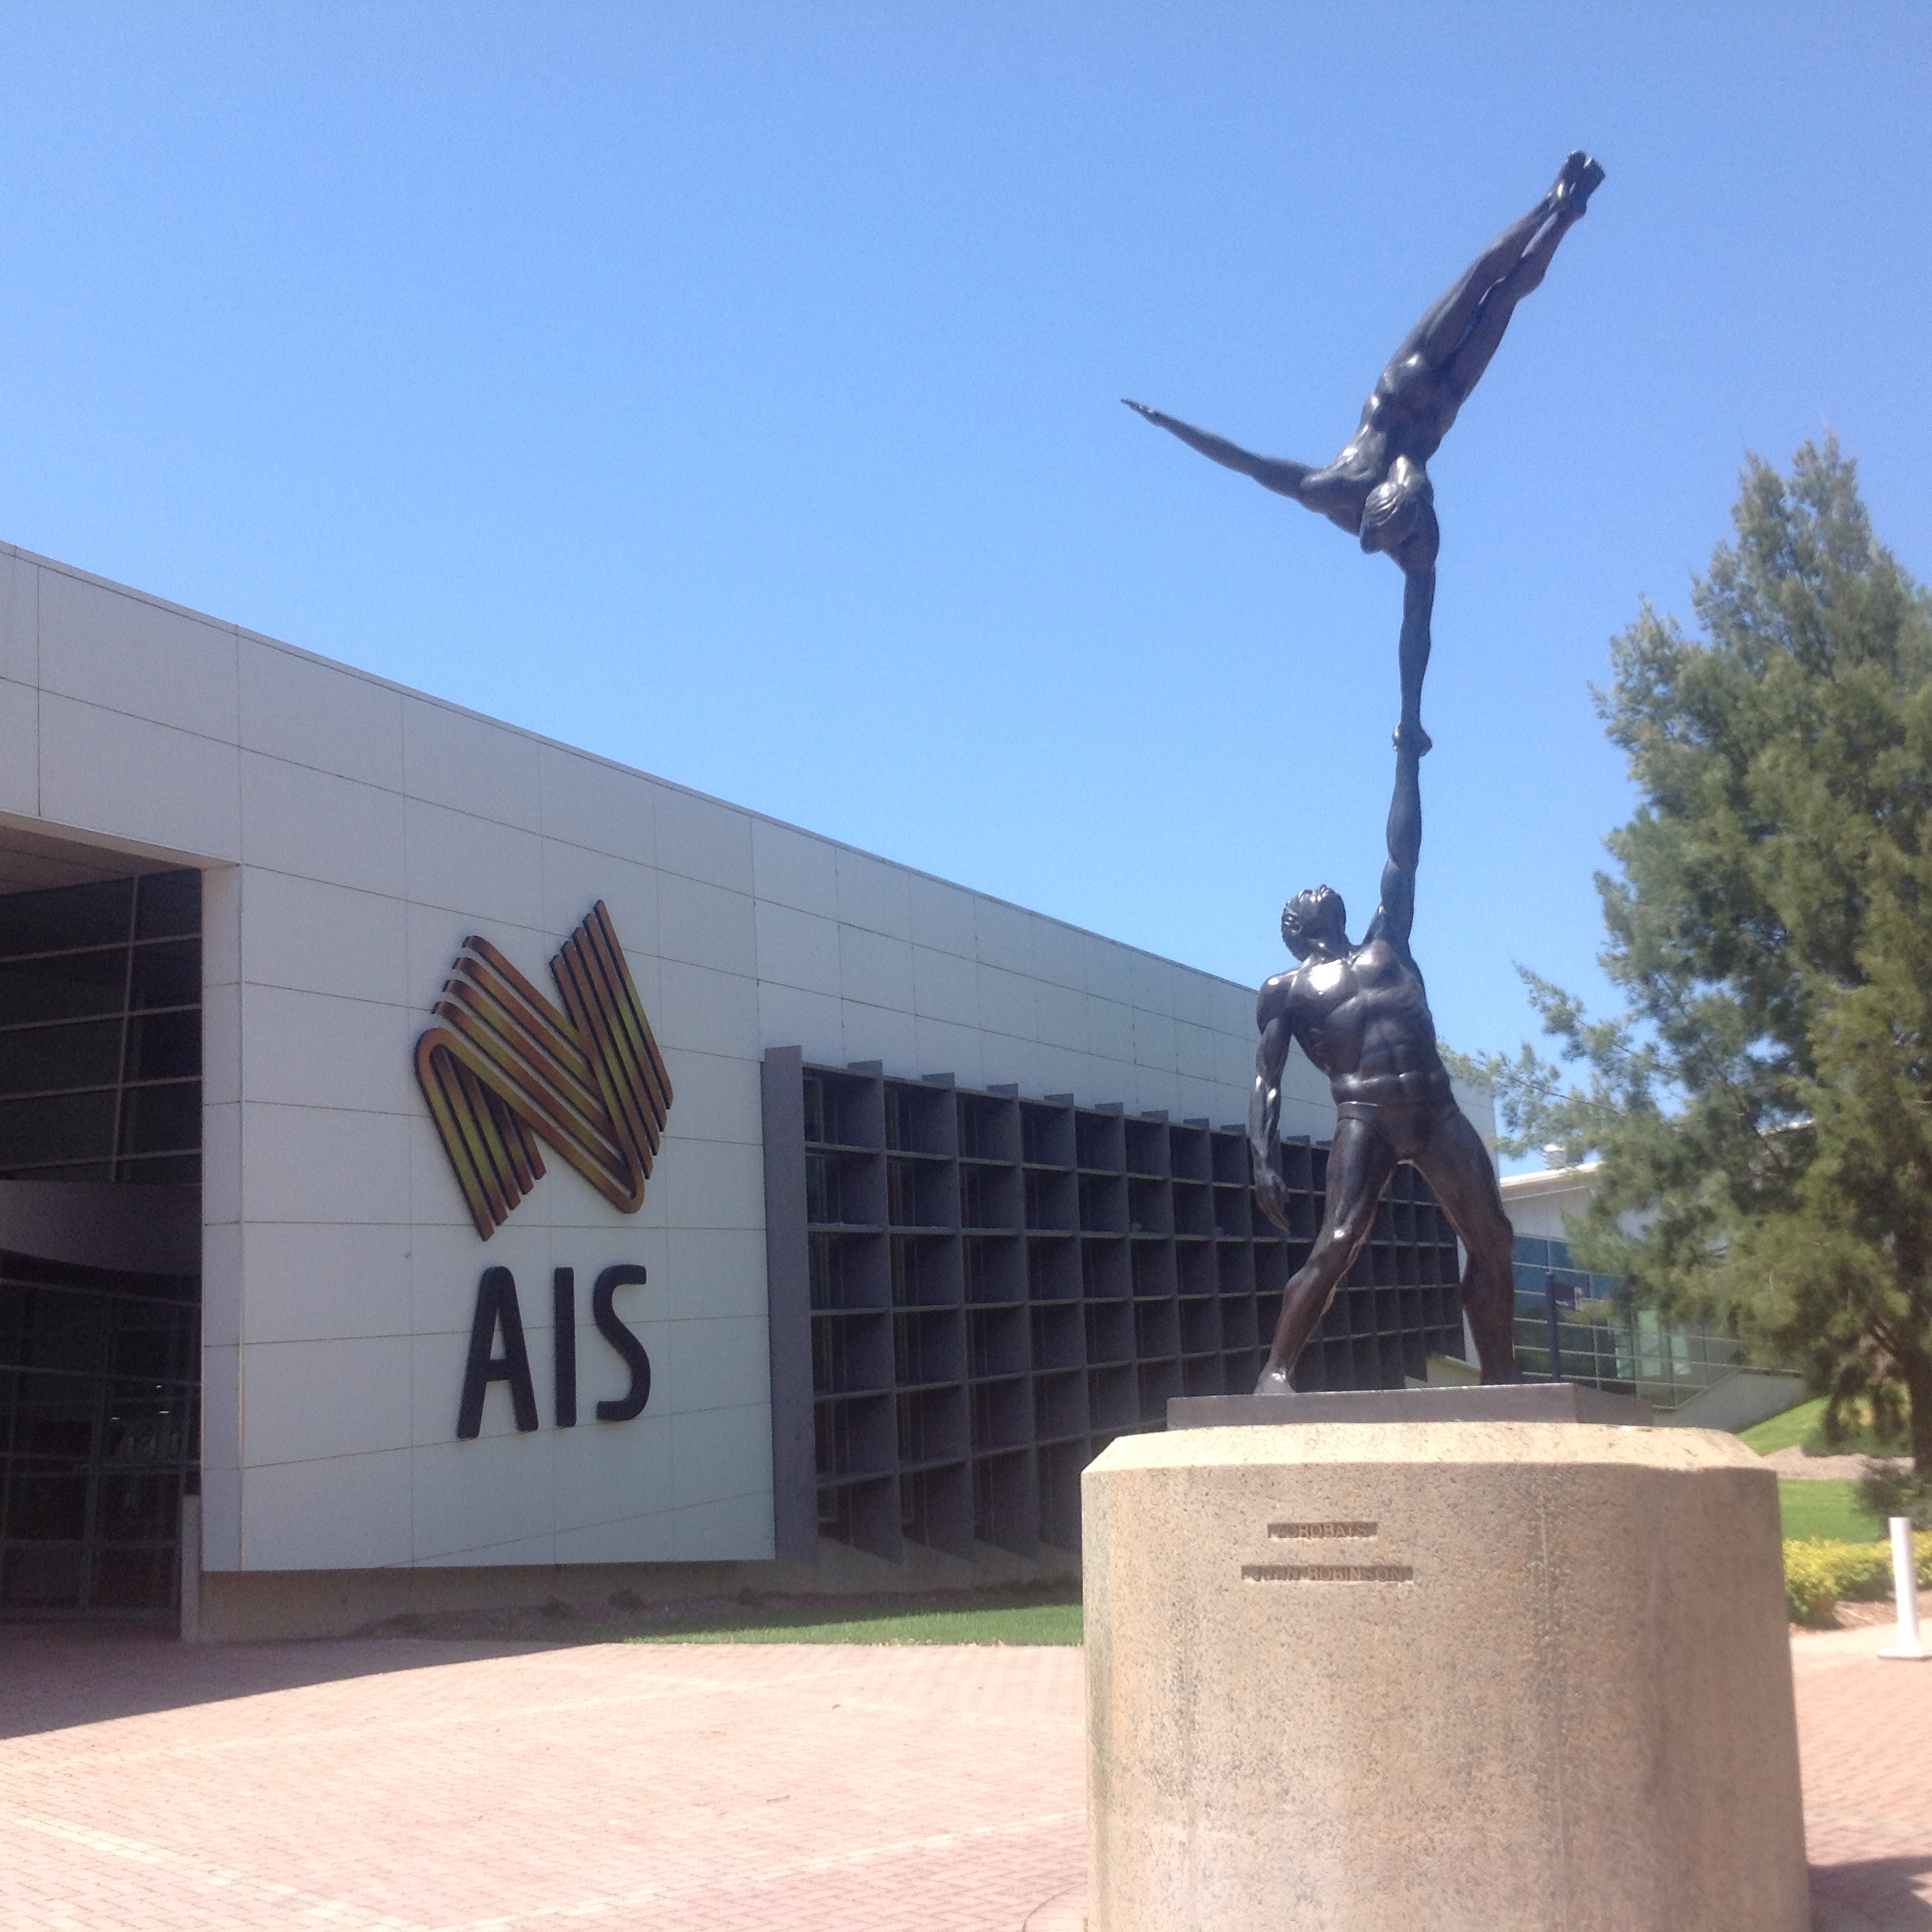 The Australian Institute of Sport